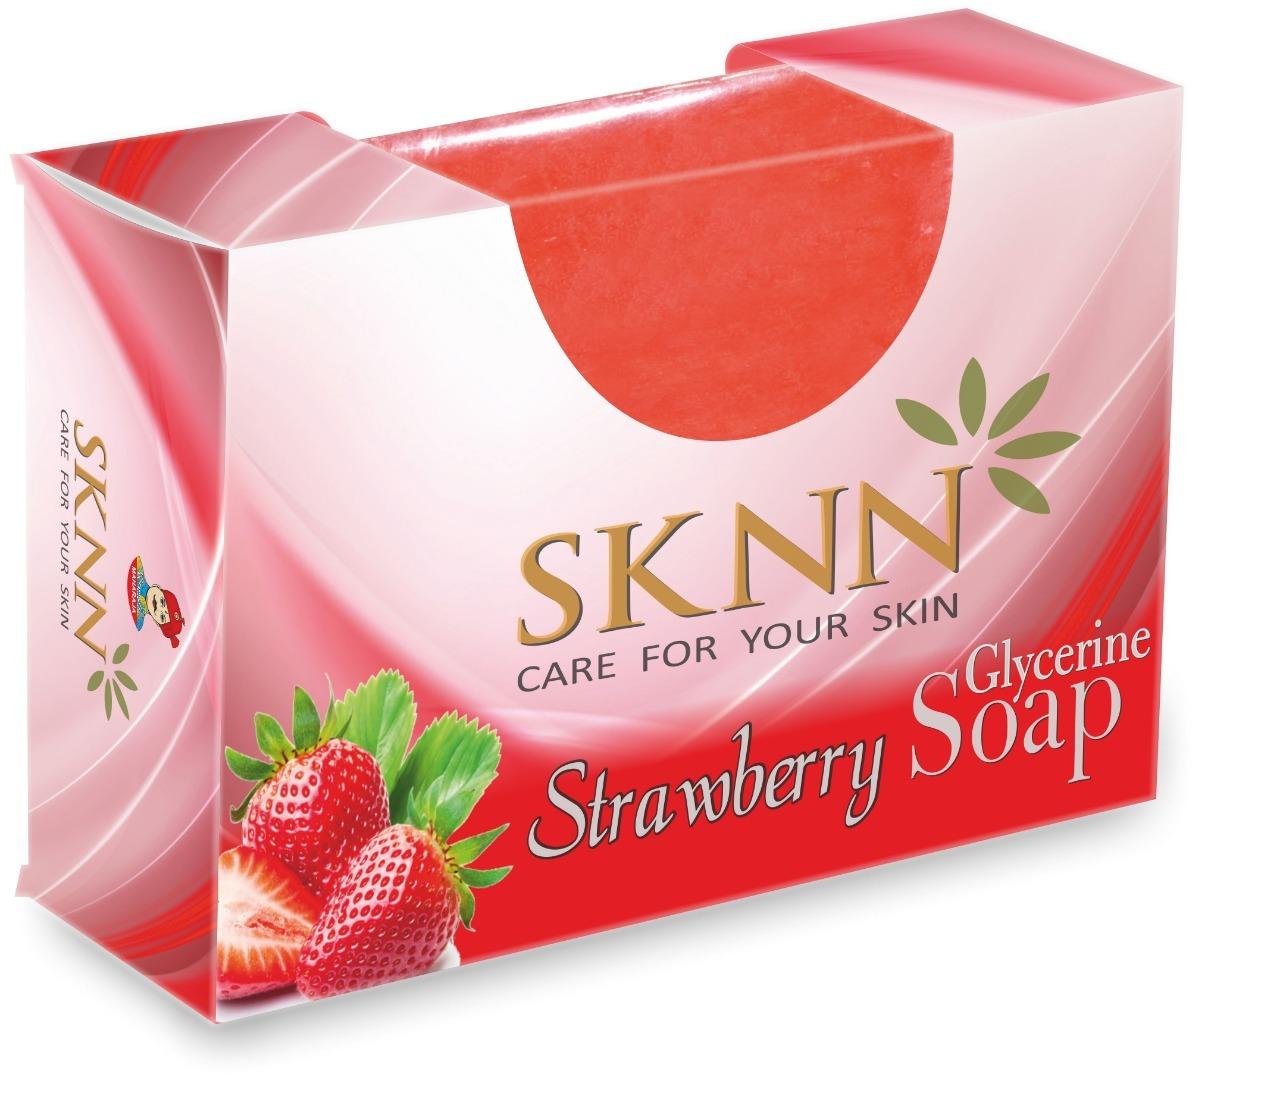 Strawberry Glycerine Soap